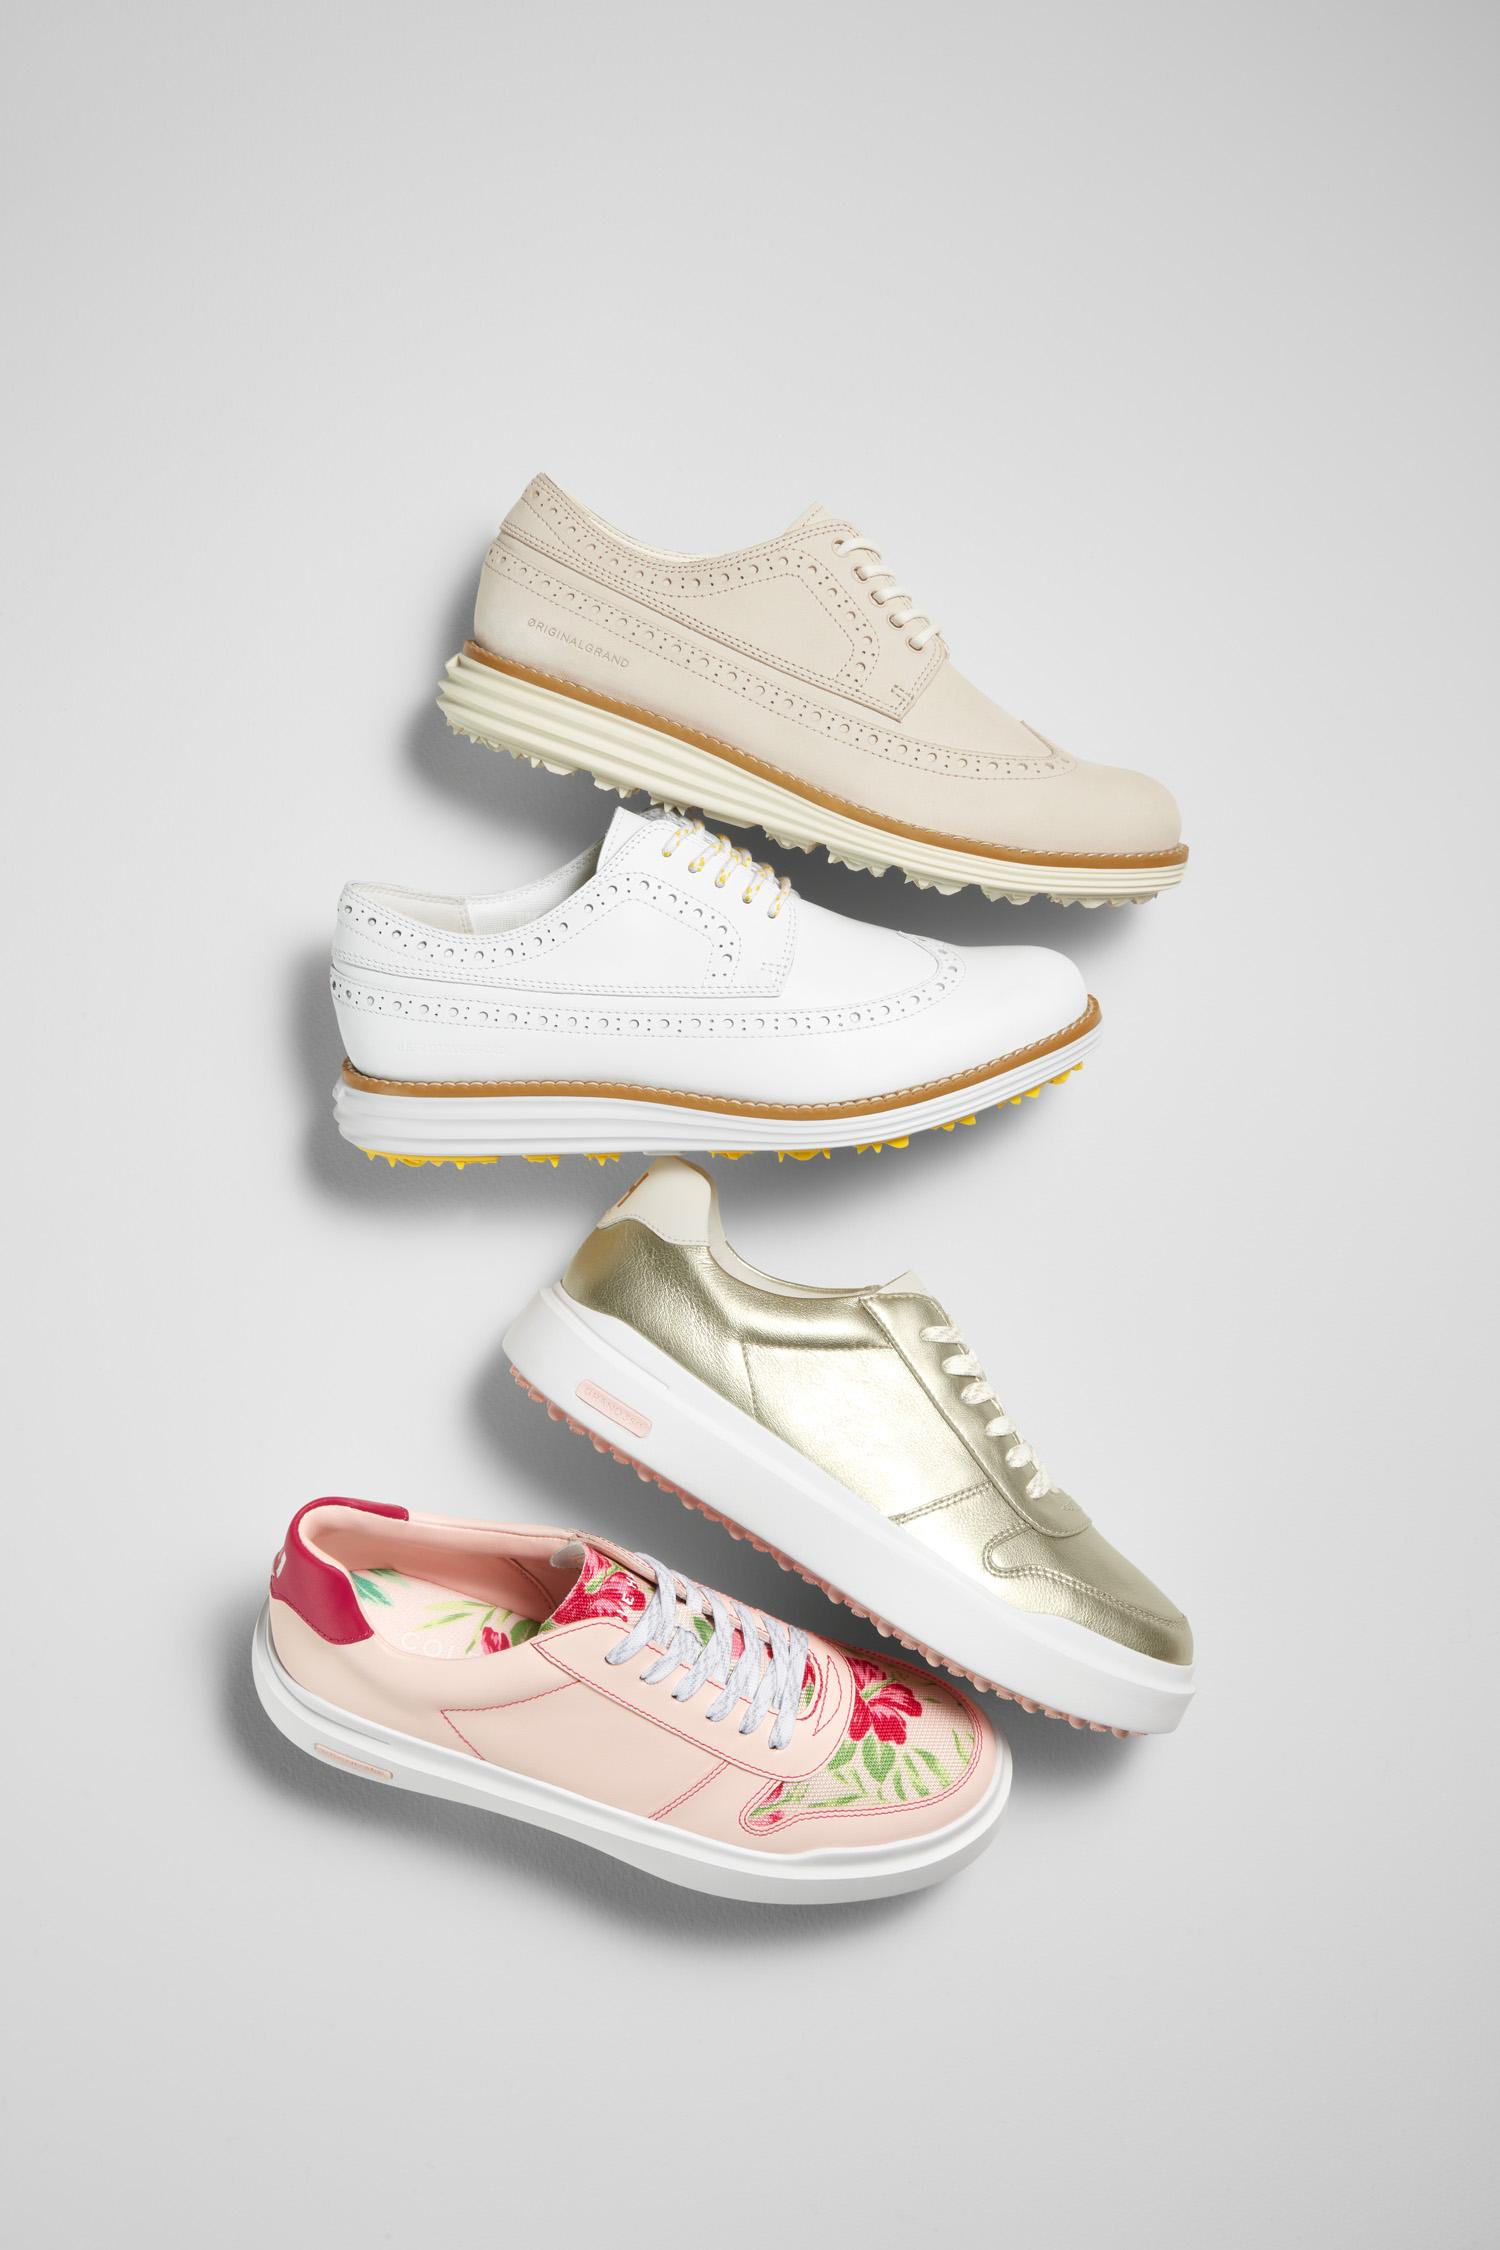 Cole Haan Women's Golf Shoes